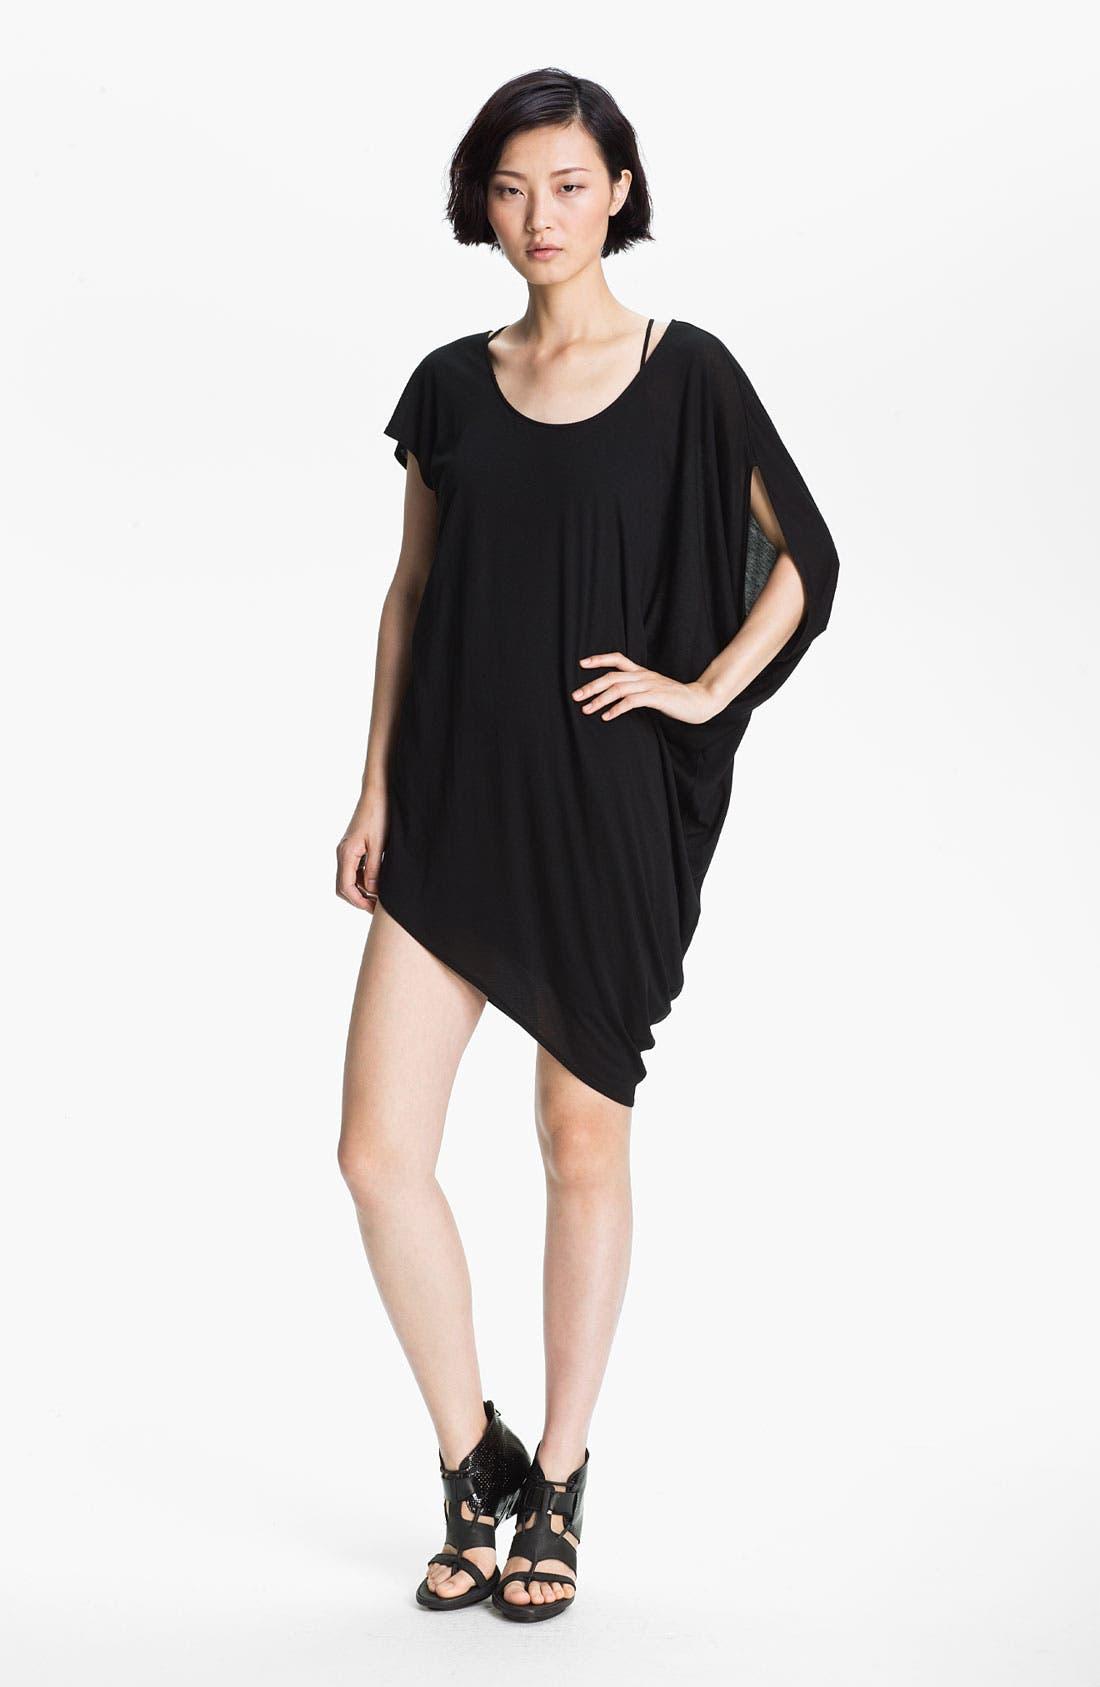 Alternate Image 1 Selected - HELMUT Helmut Lang 'Kinetic' Asymmetrical Jersey Dress